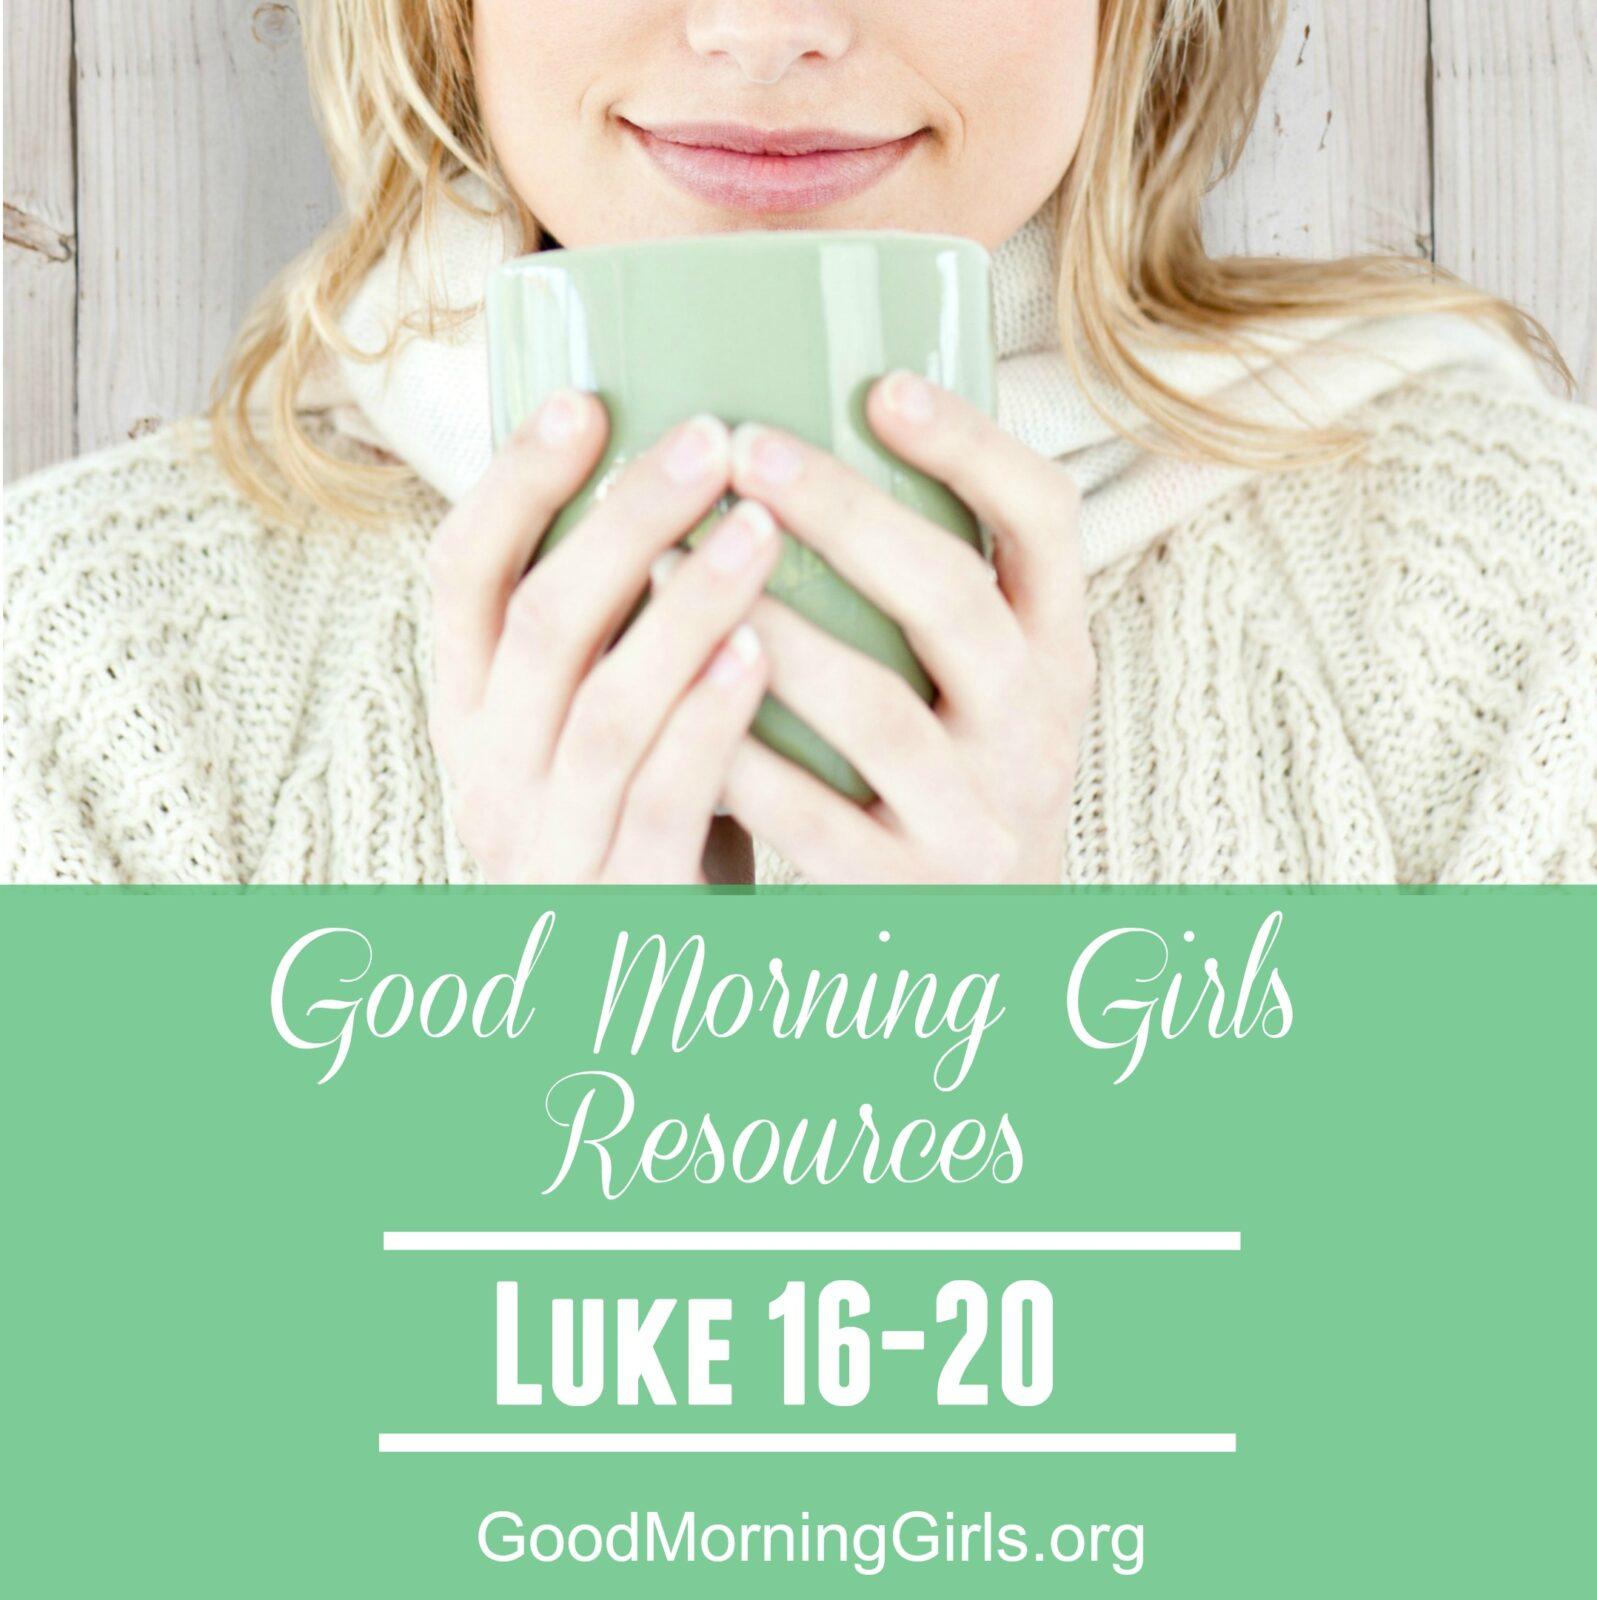 Good Morning Girls Resources {Luke 16-20} - Women Living Well